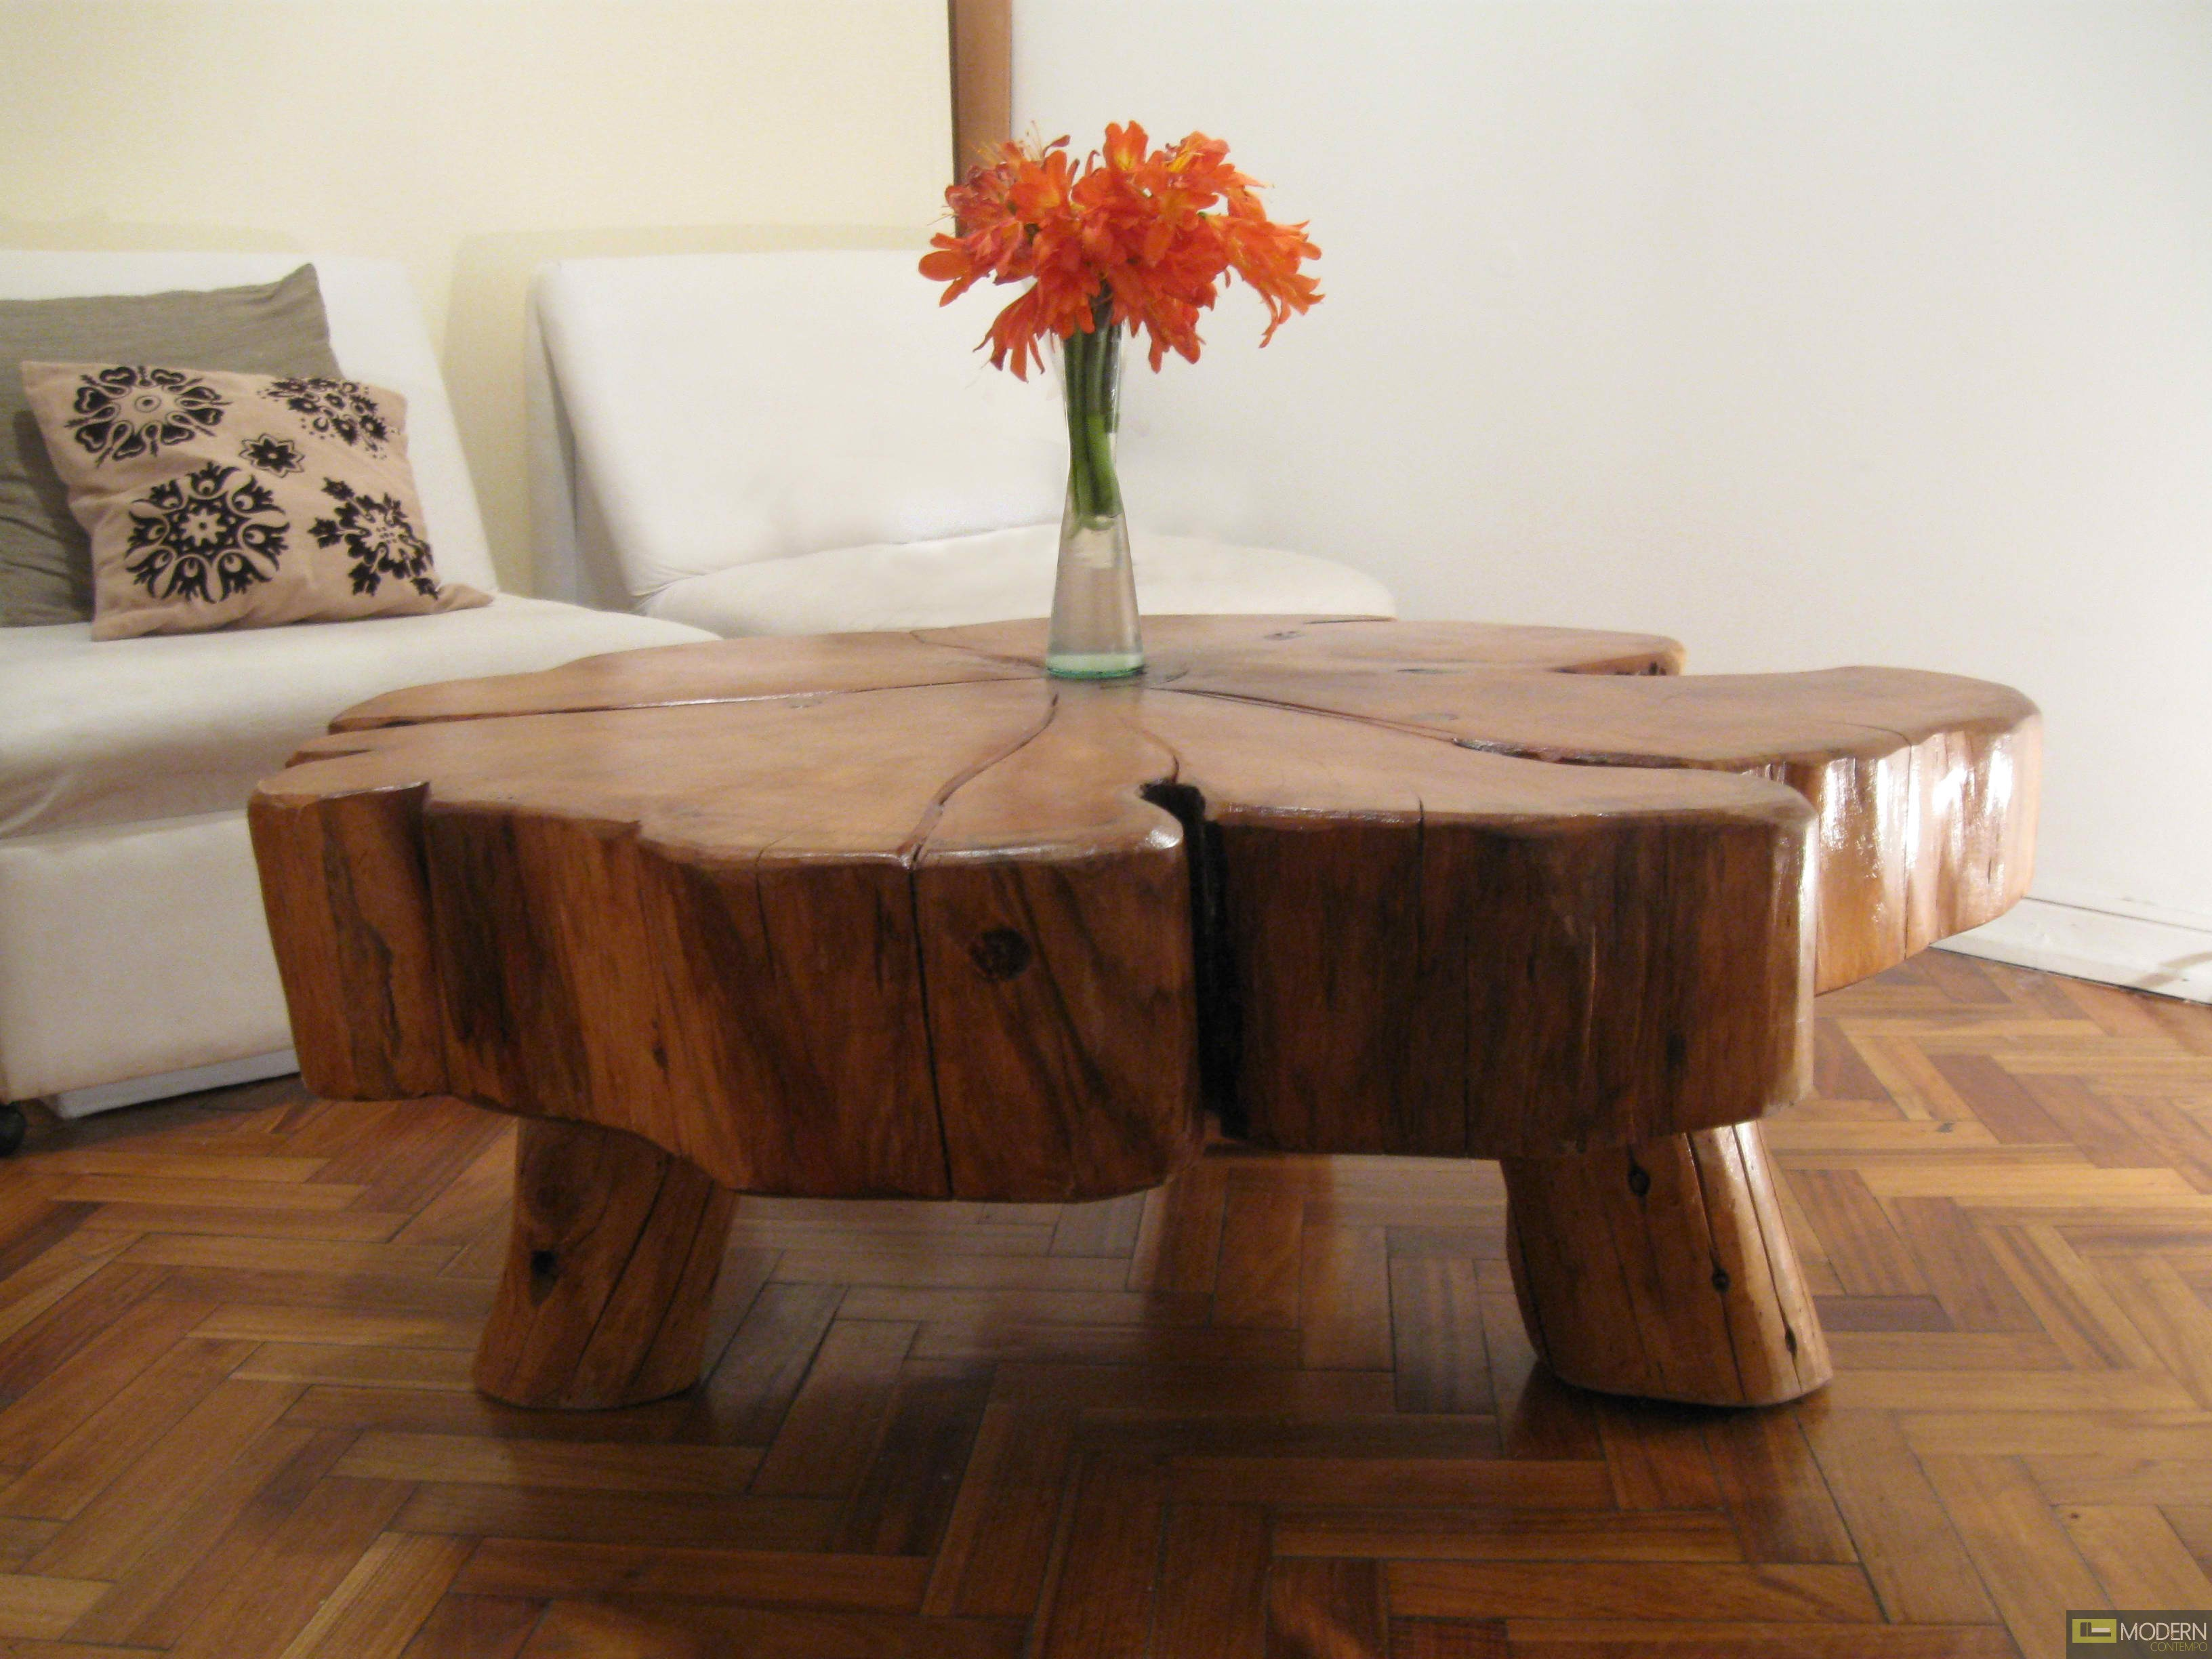 Patagonia Rustic Grand Coffee Table